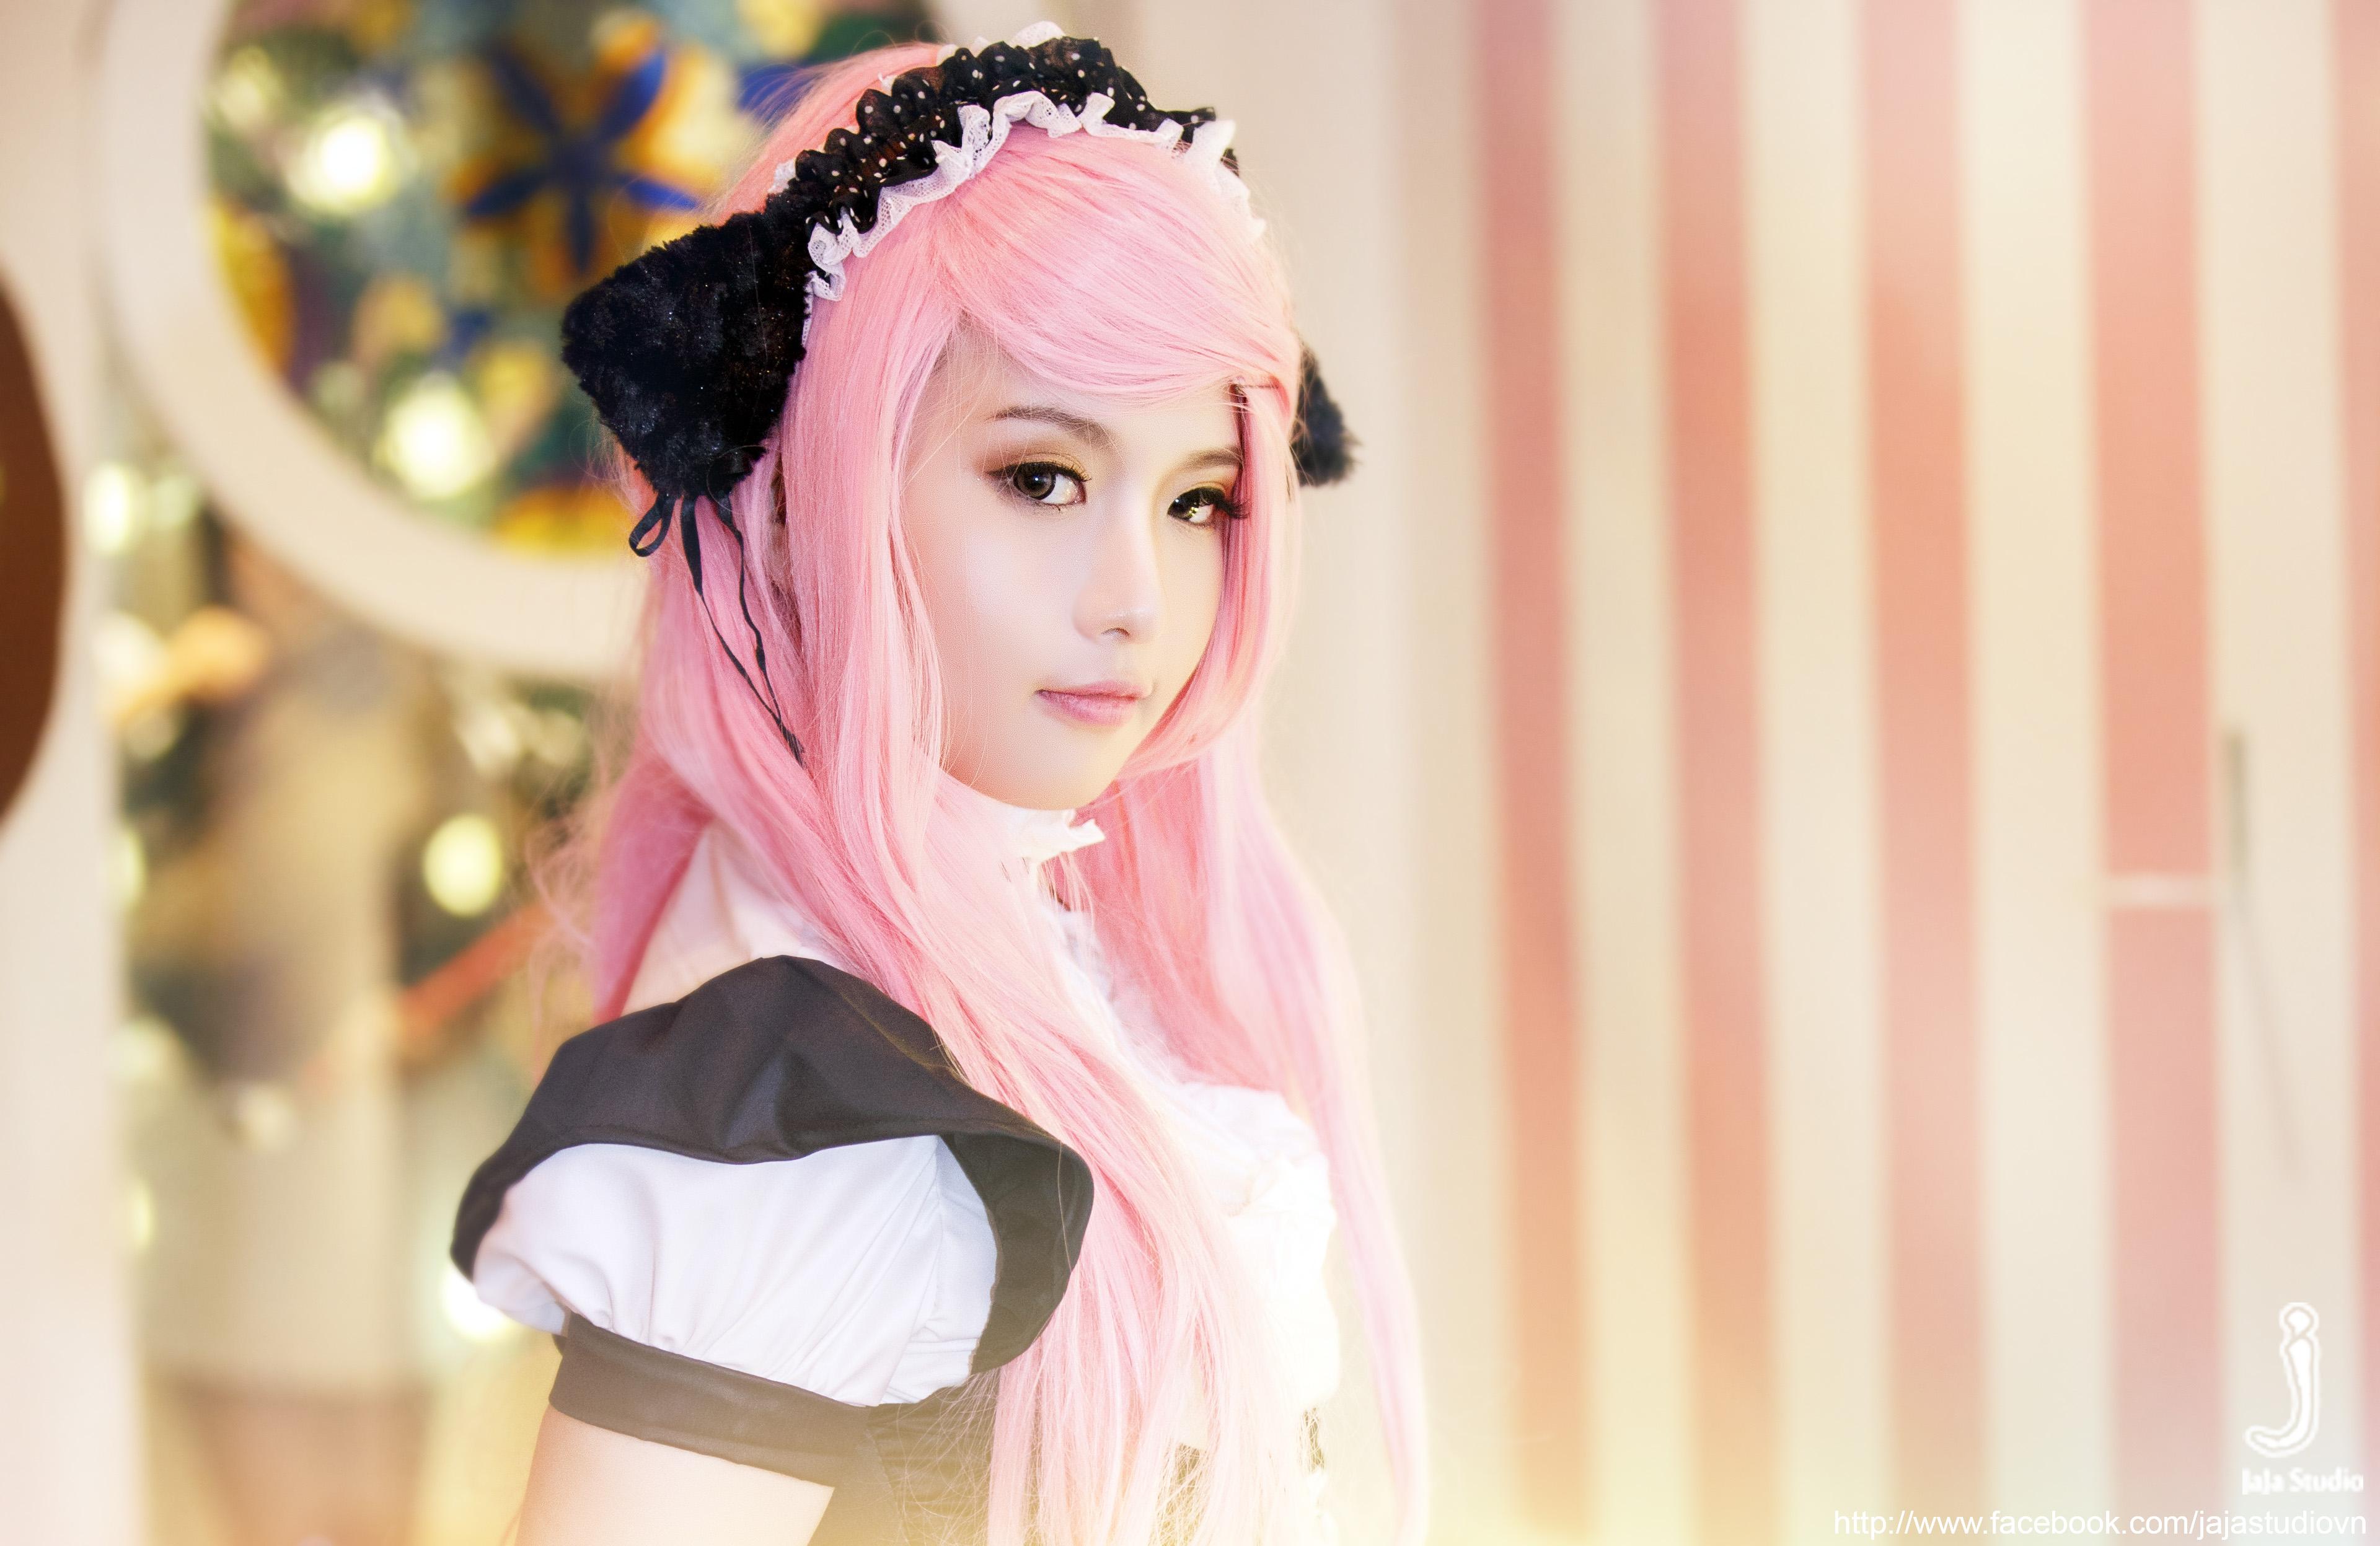 4k Ultra HD Anime Girl Wallpapers - Wallpaper Cave